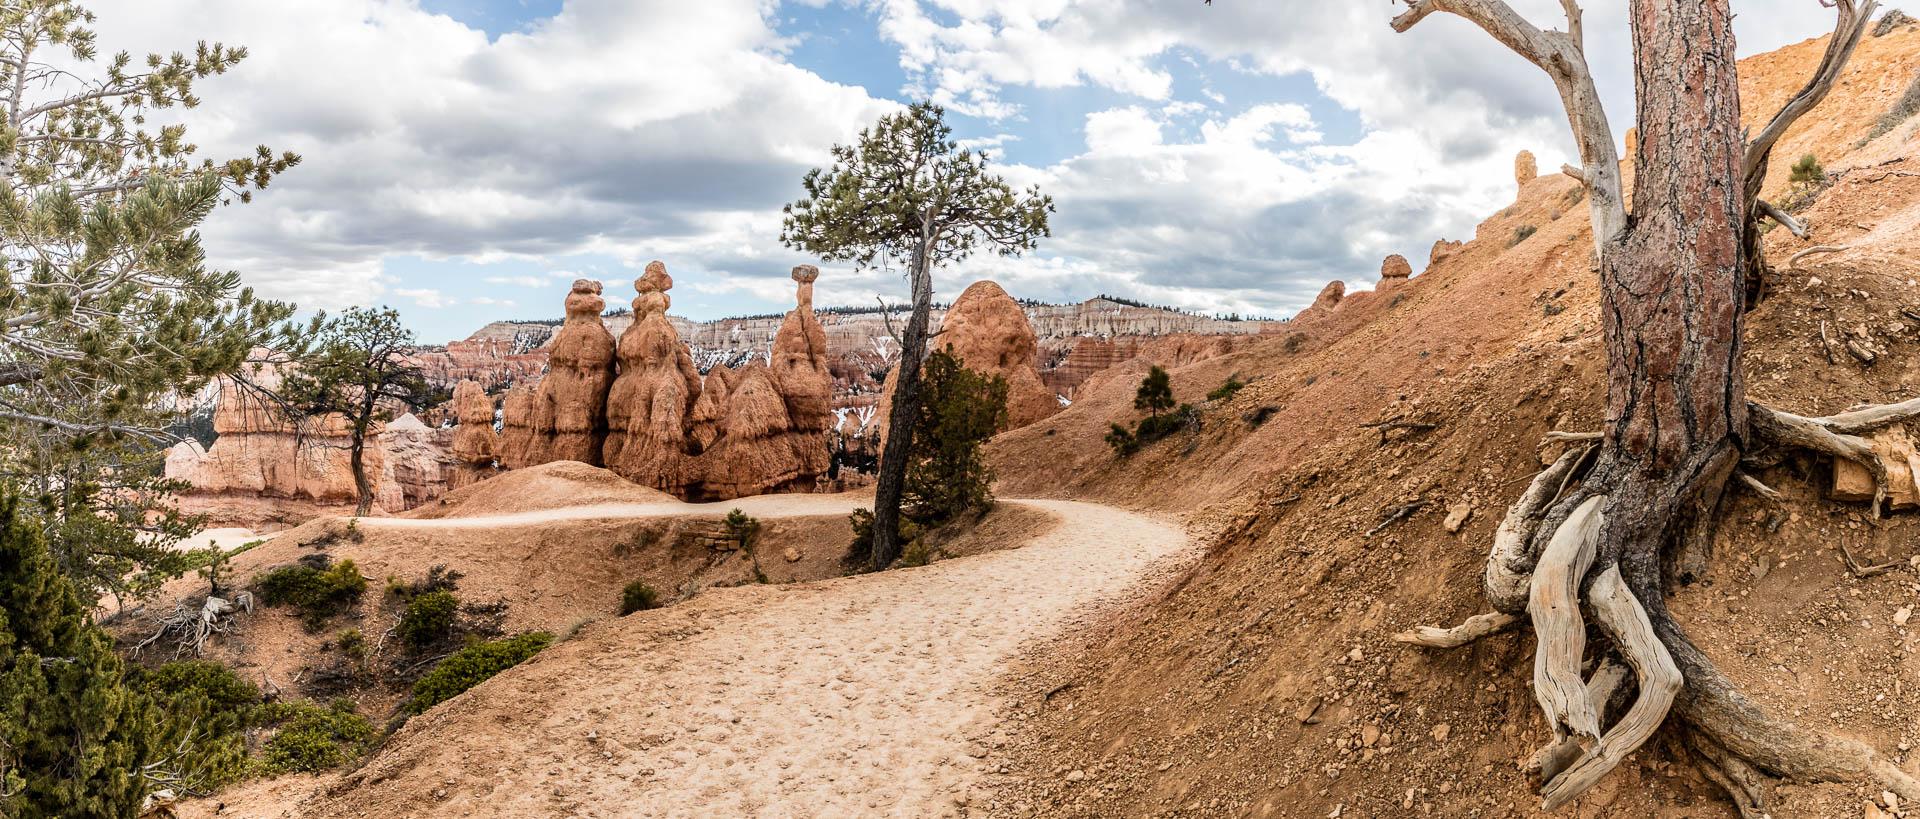 LDKphoto - Bryce Canyon - 04.jpg